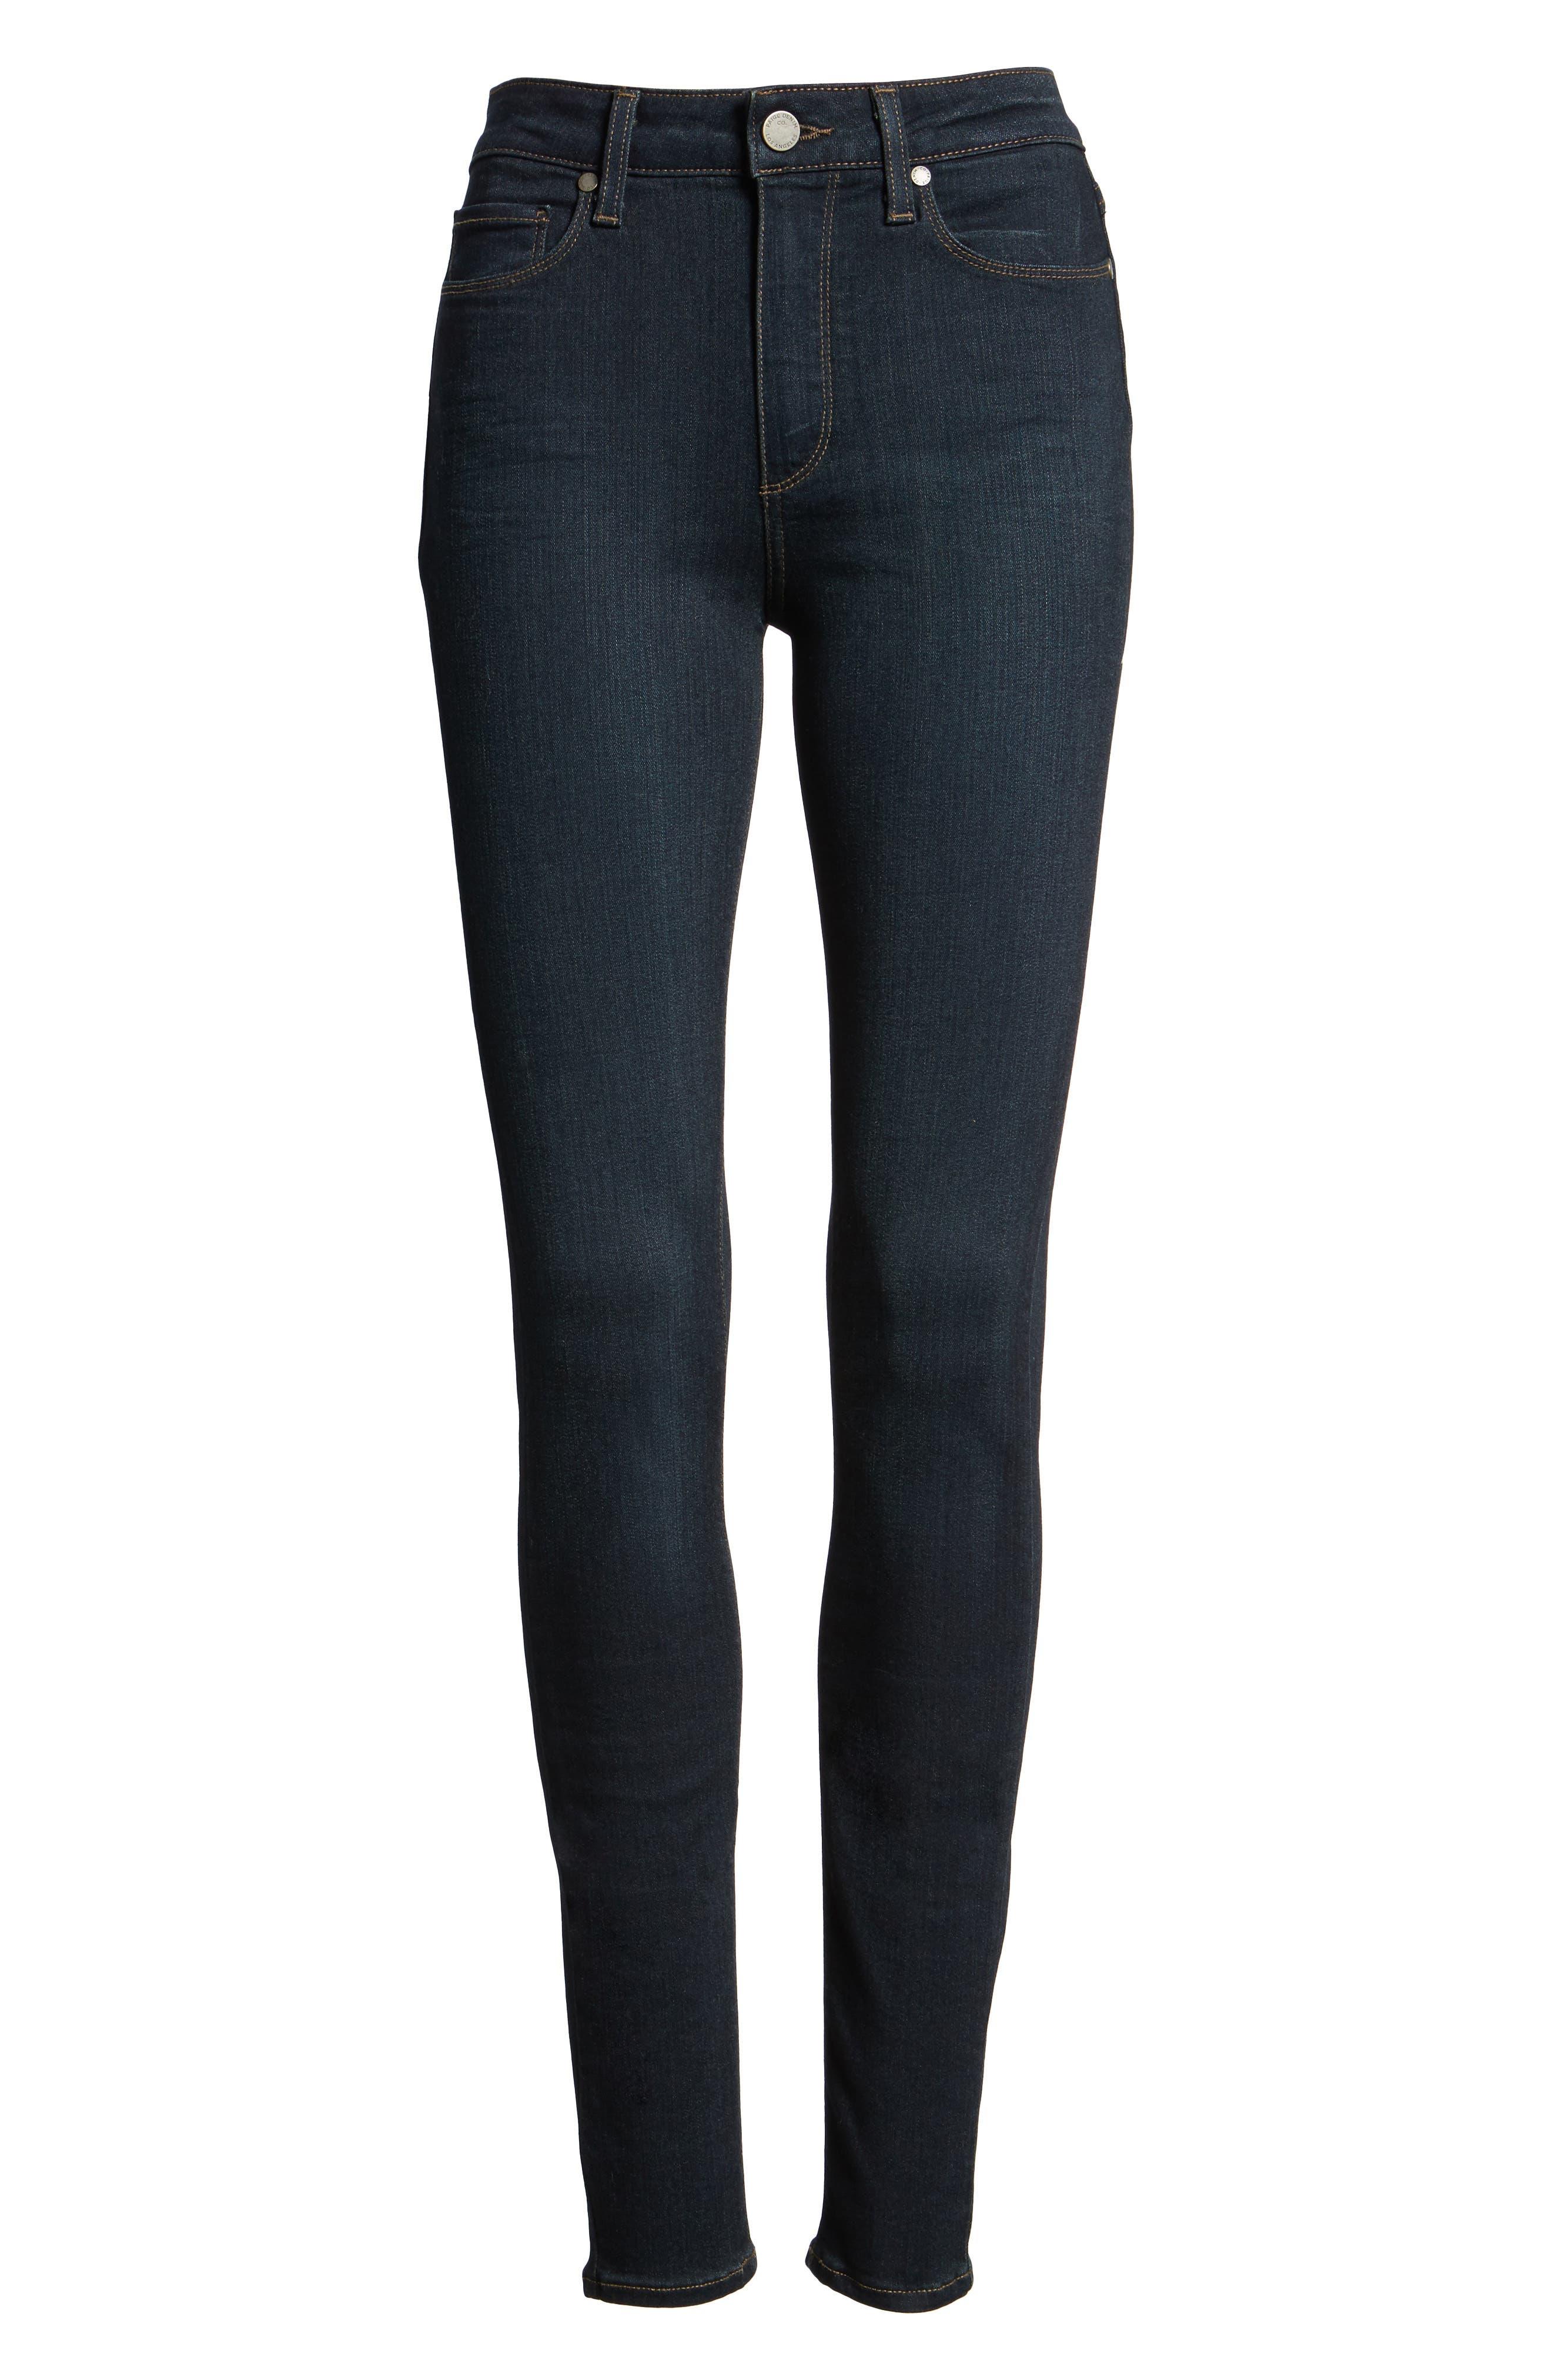 PAIGE, Transcend - Hoxton High Waist Ultra Skinny Jeans, Alternate thumbnail 4, color, MONA